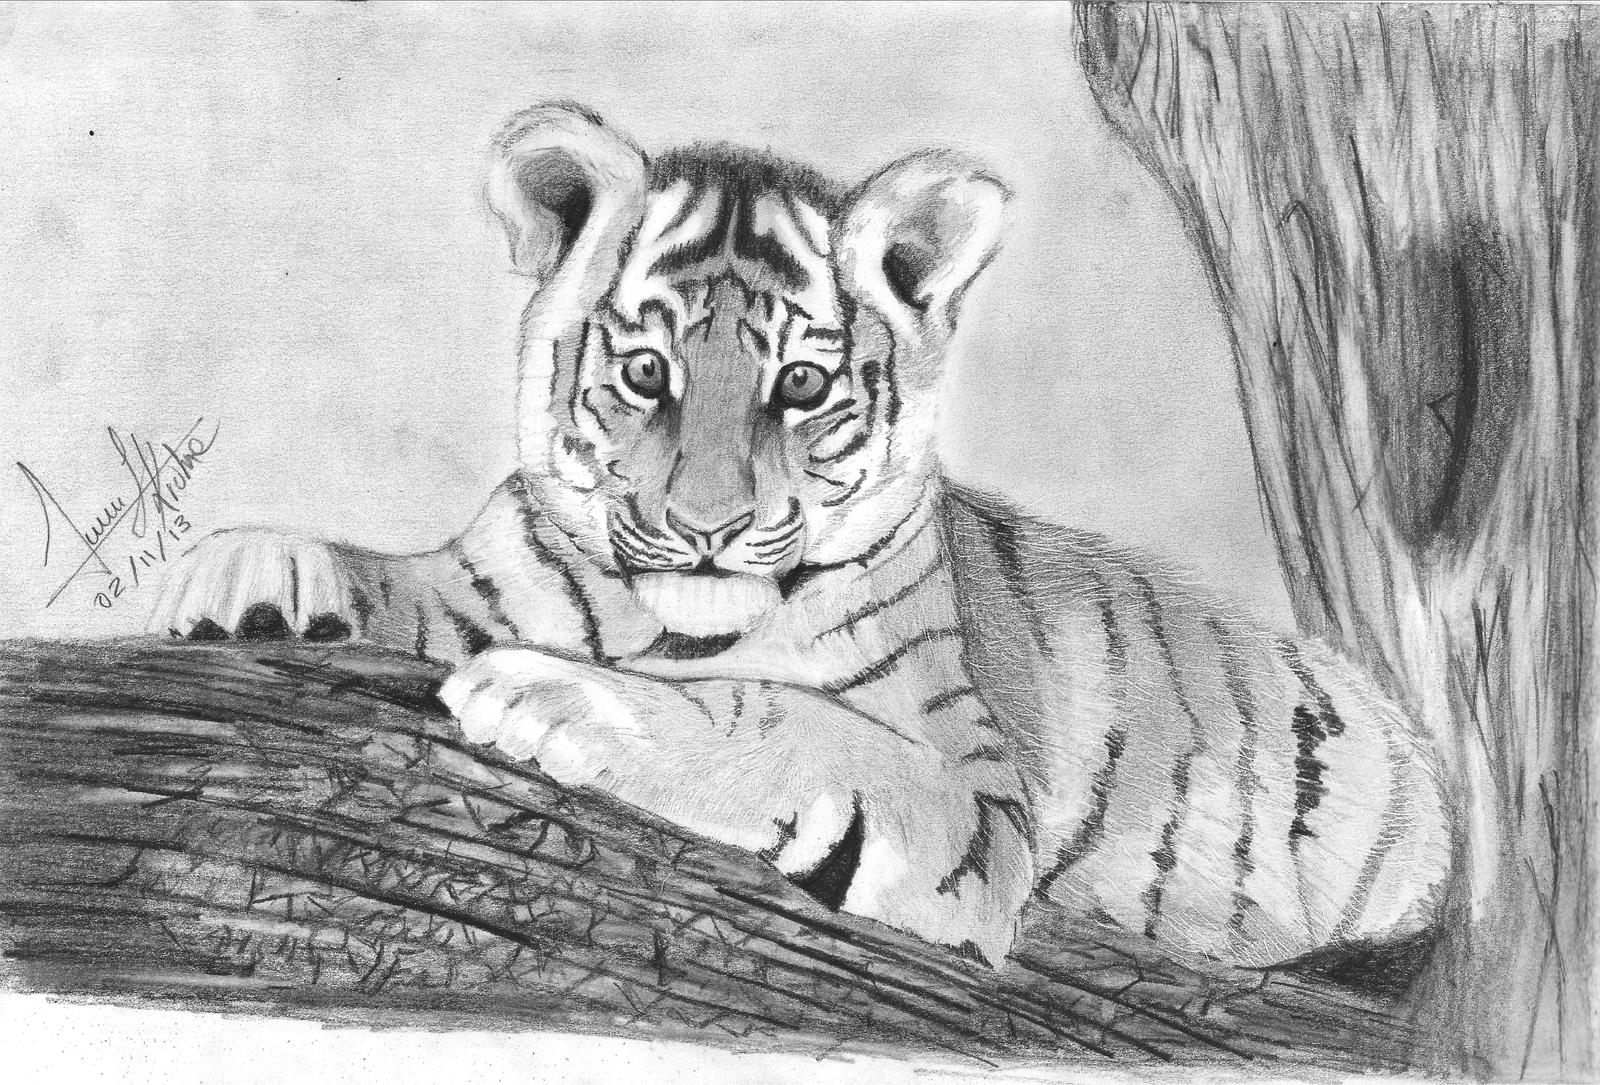 baby tiger draw 25 by juansk on deviantart